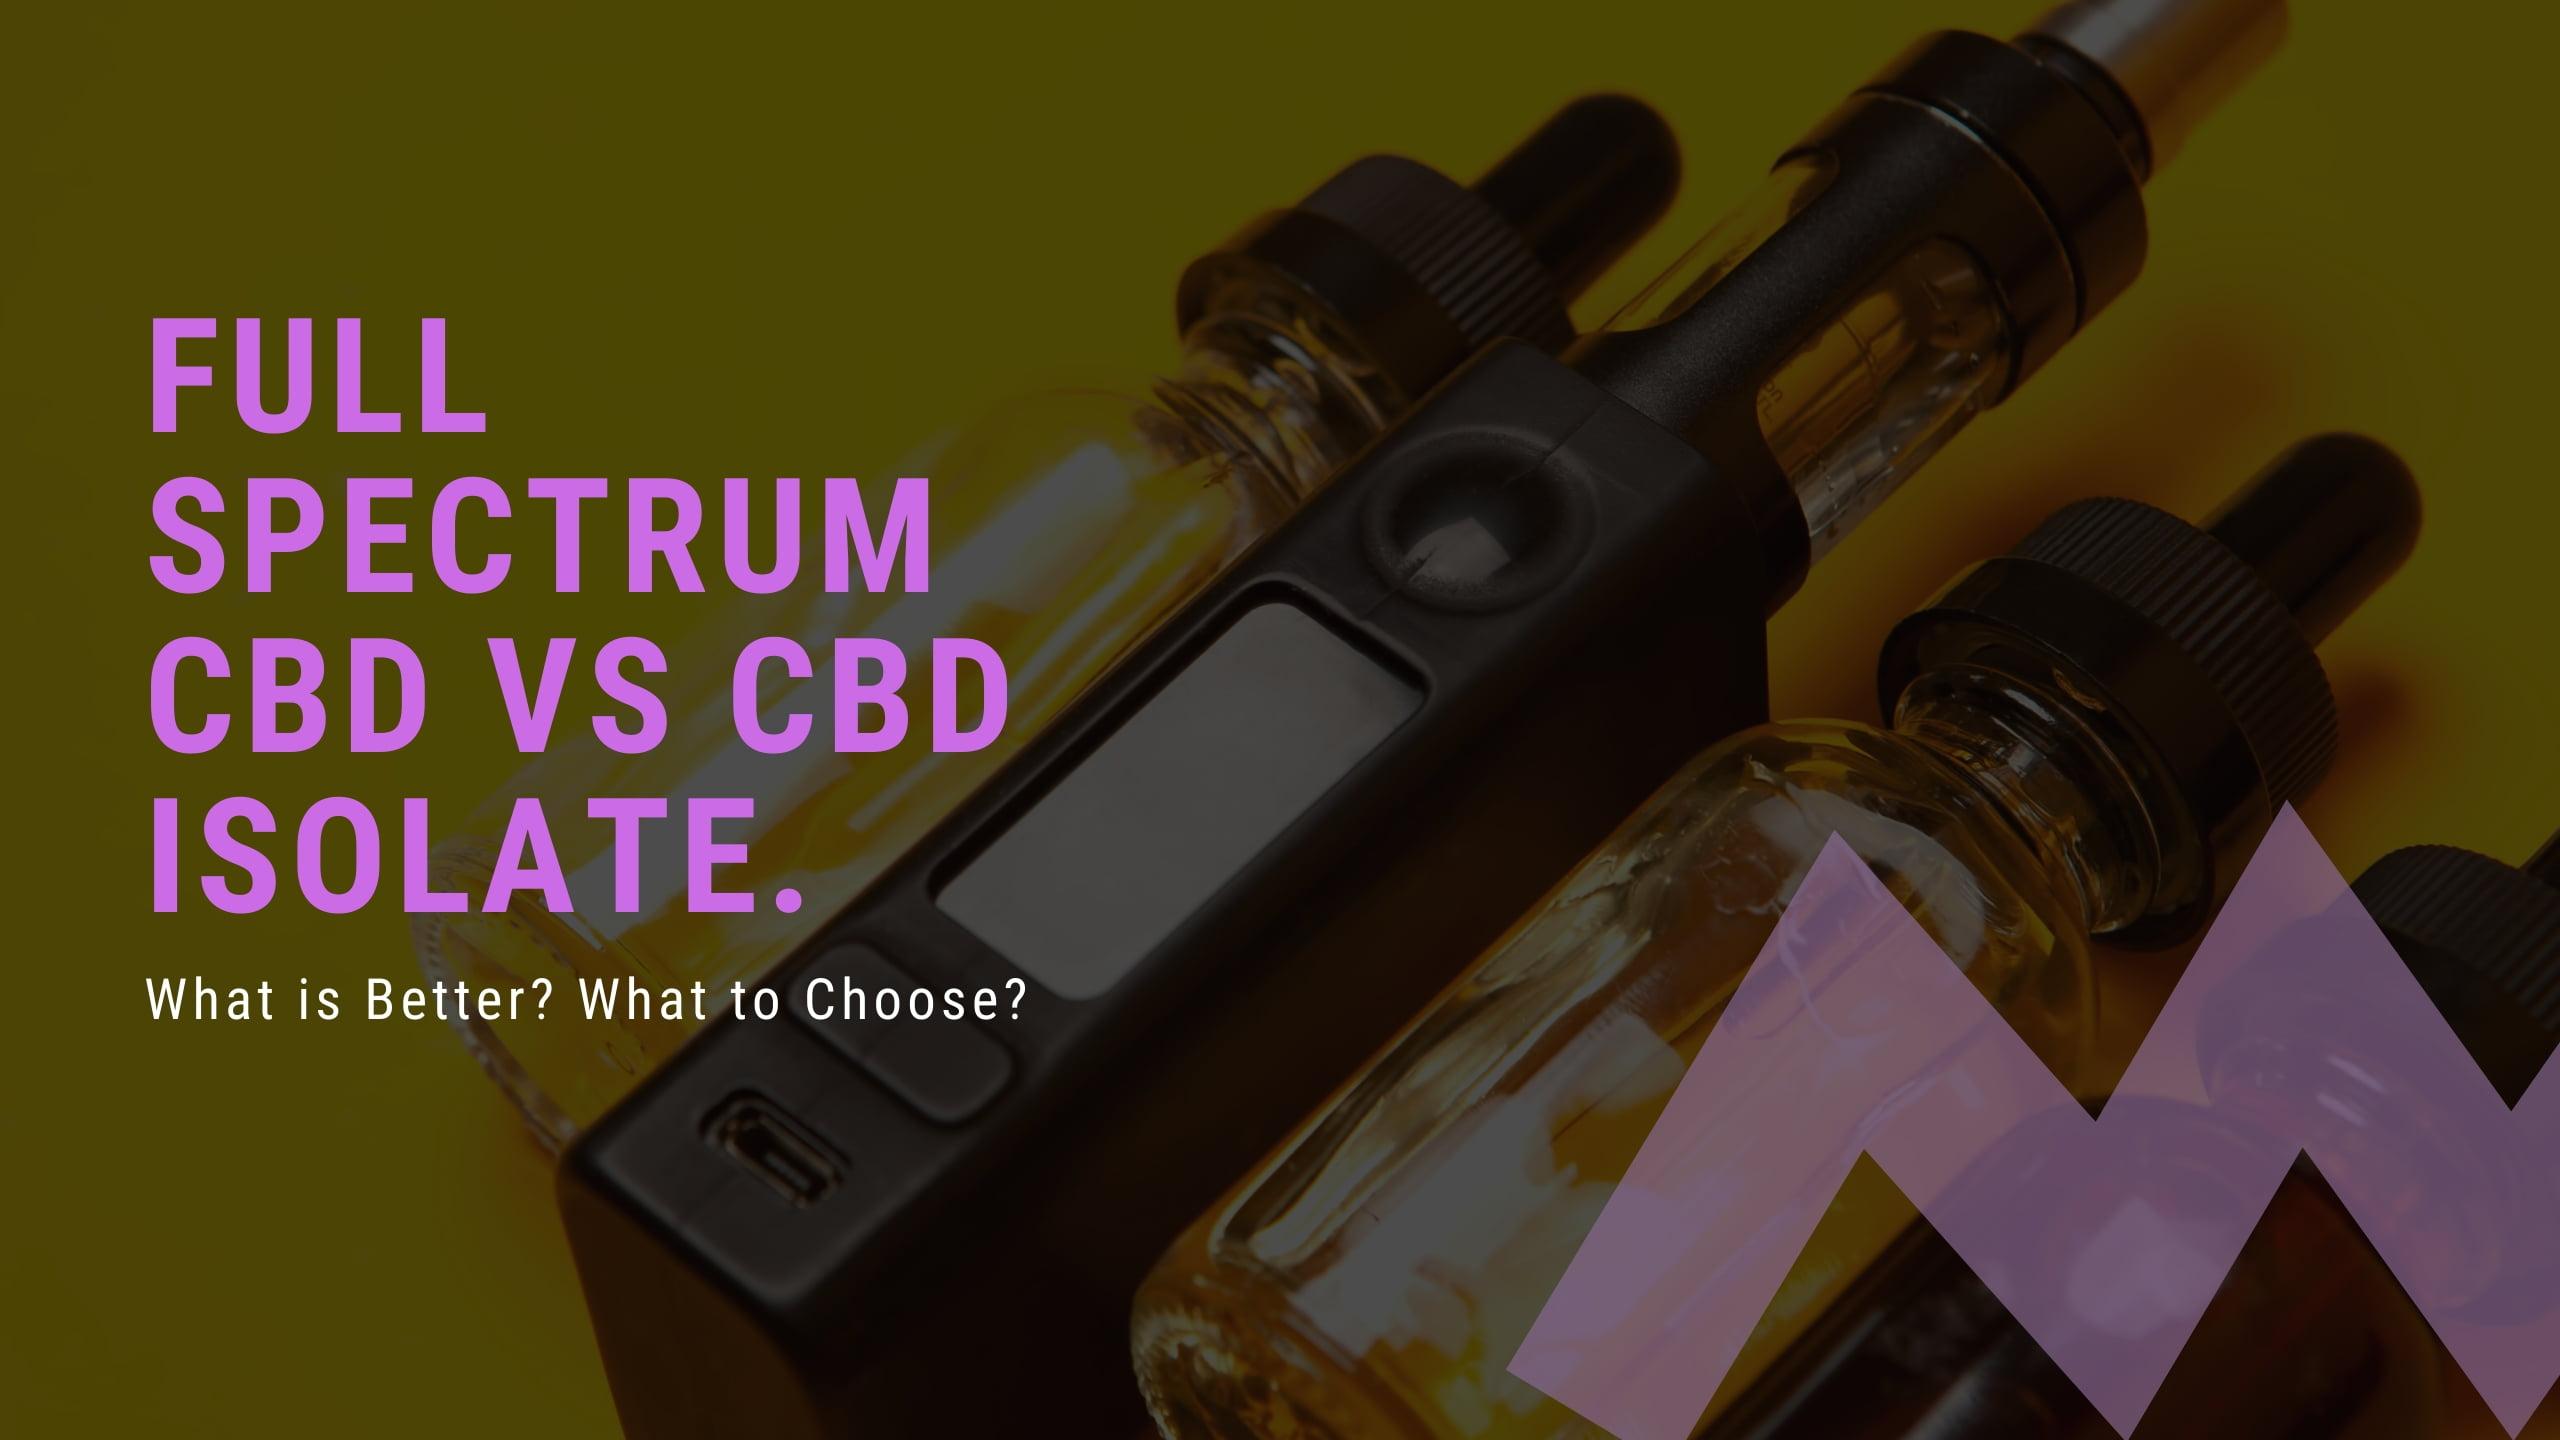 Full Spectrum CBD vs CBD Isolate – What is Better? What to Choose?